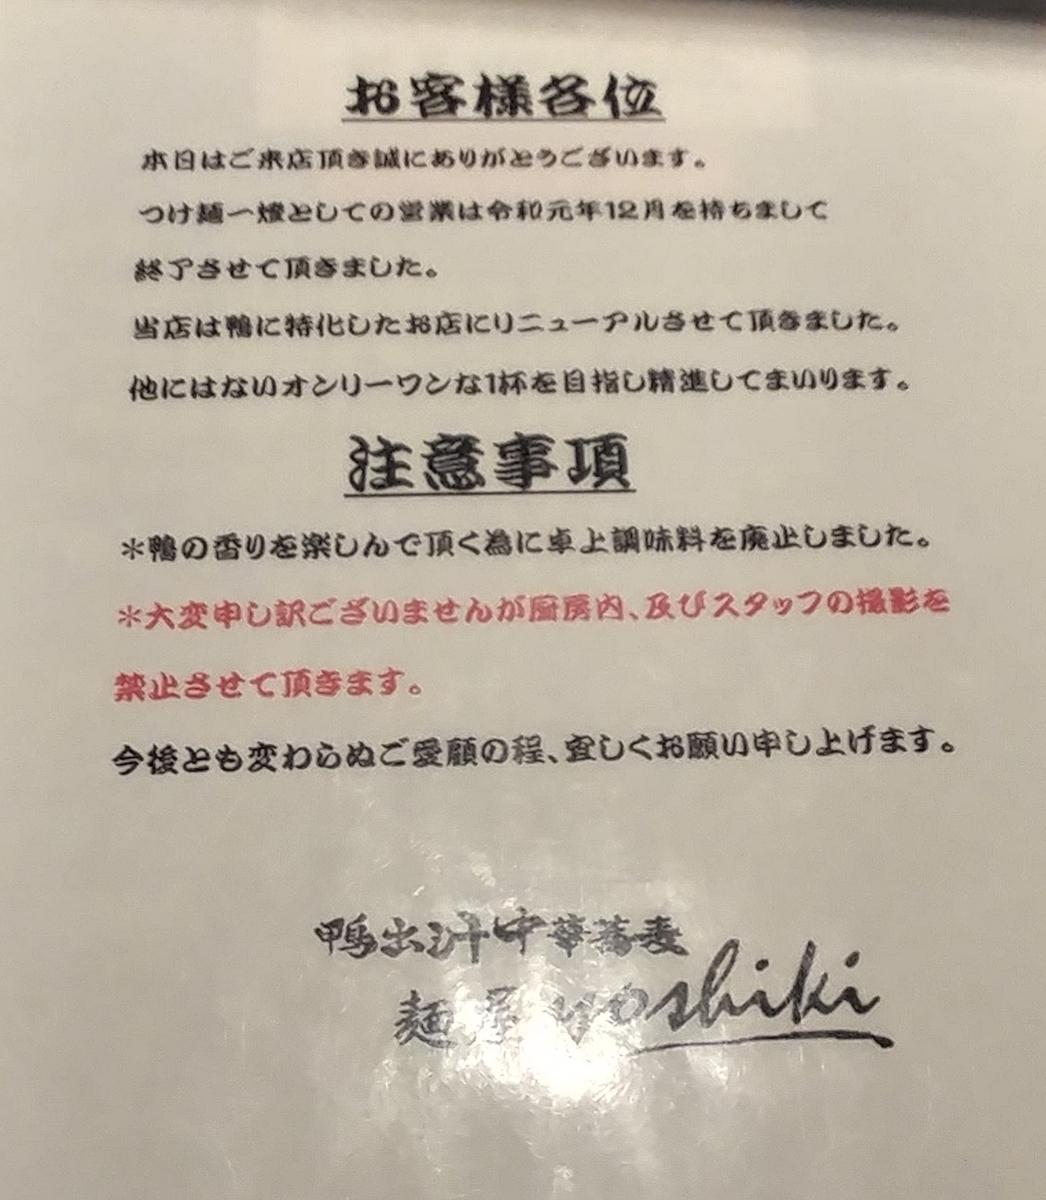 f:id:kuishinbo-ojisan:20200710131743j:plain